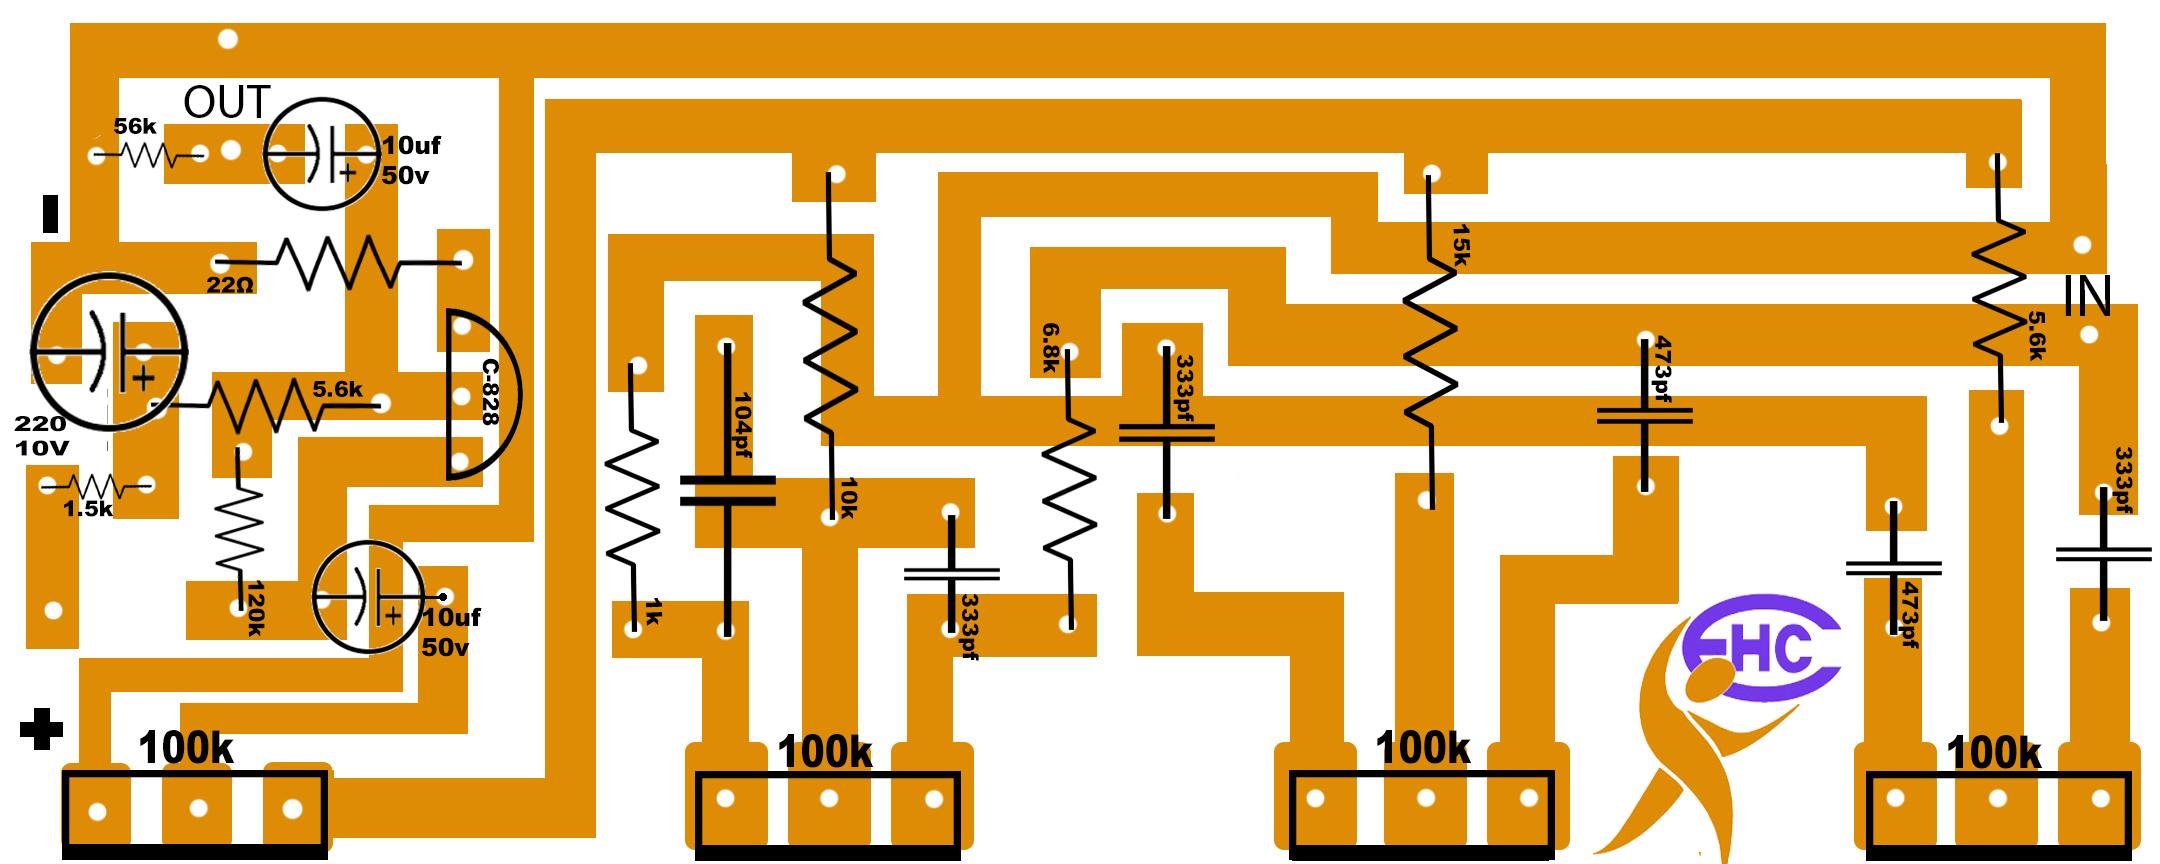 Bass tone circuit diagram